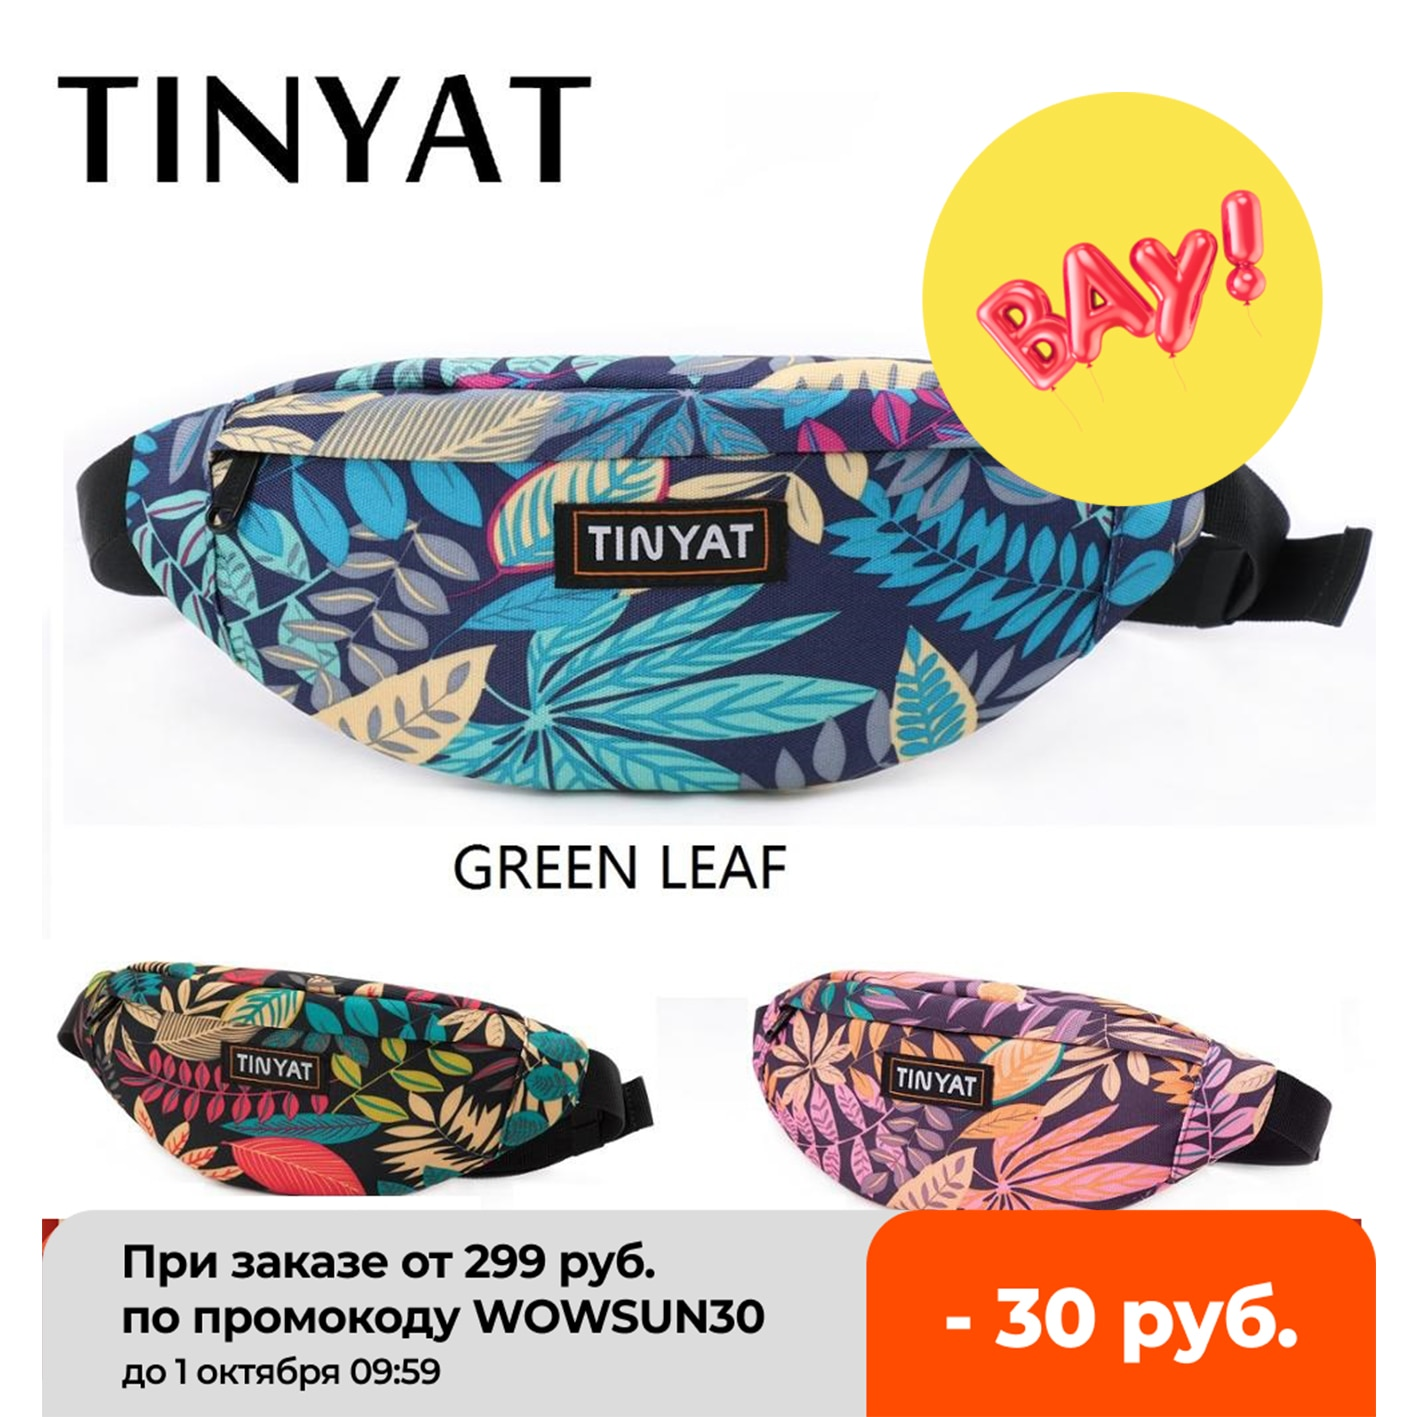 TINYAT Print Leaf Waist pack Bag For Men Women Fashion Casual Men's Belt Bag Pouch Travel Female Banana bags Kid Fanny pack Bags